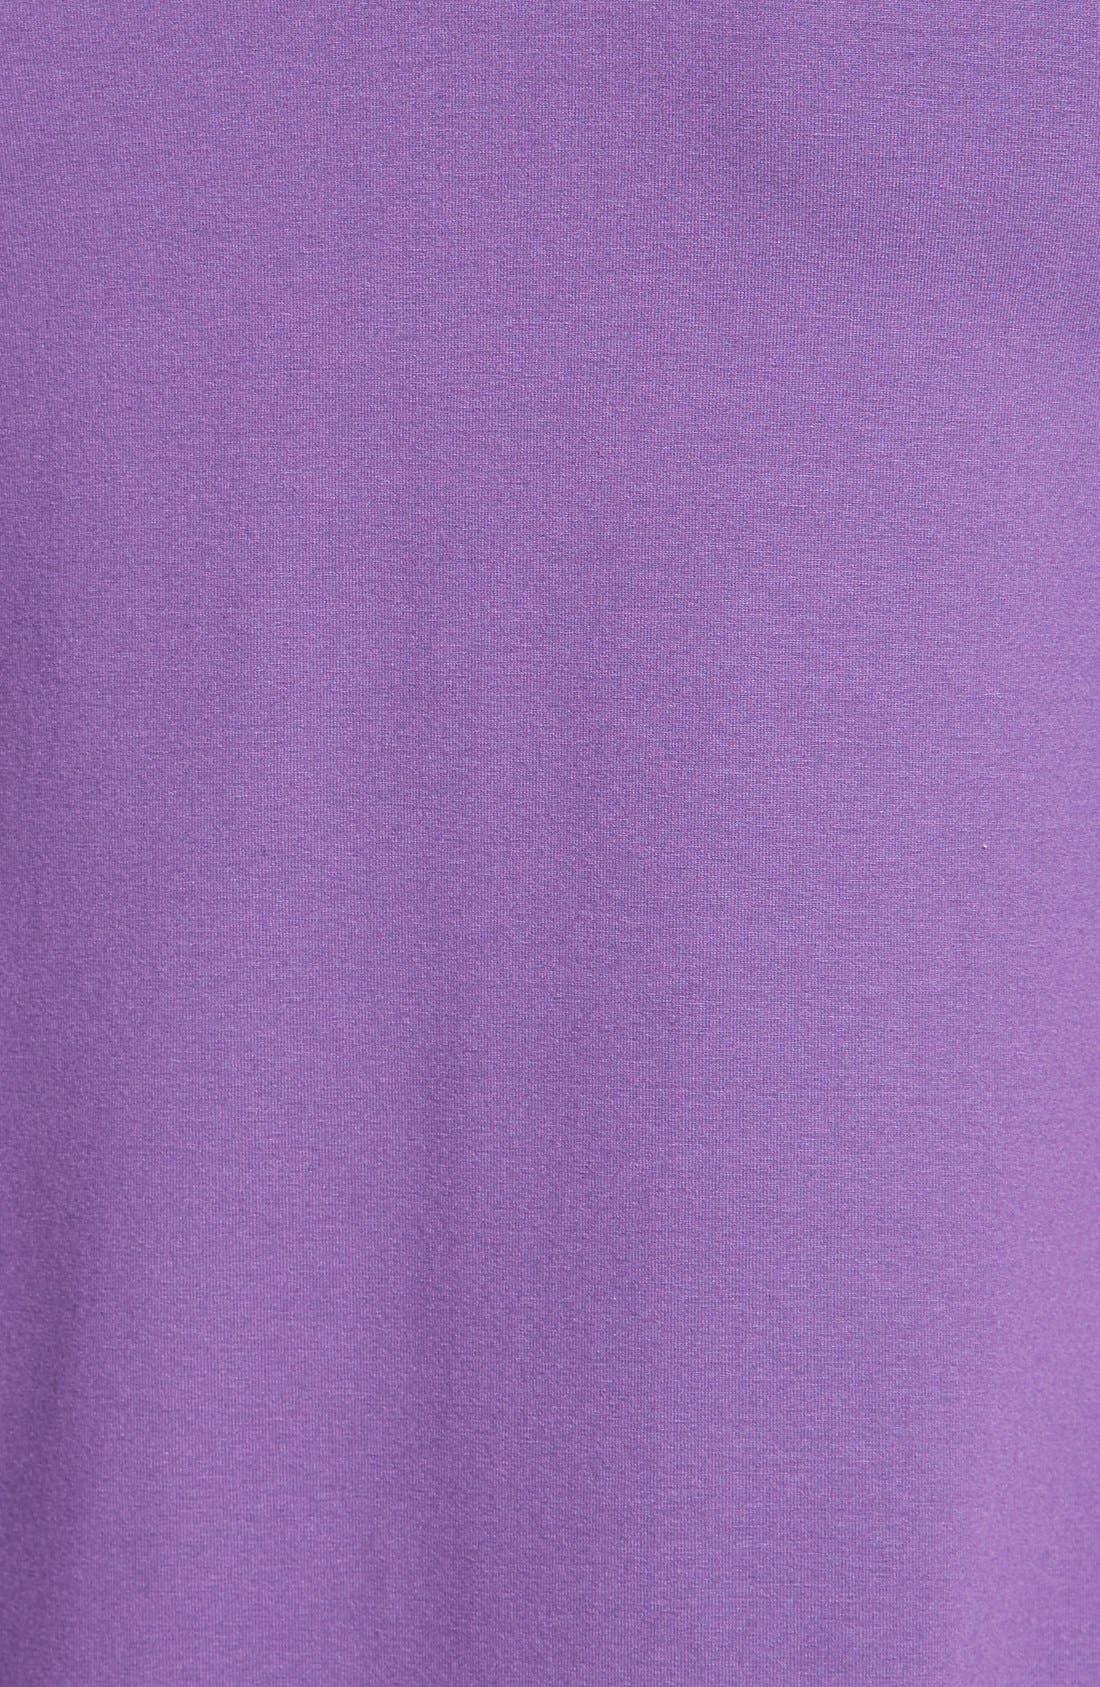 Alternate Image 3  - Eileen Fisher Elbow Sleeve Tunic (Regular & Petite)